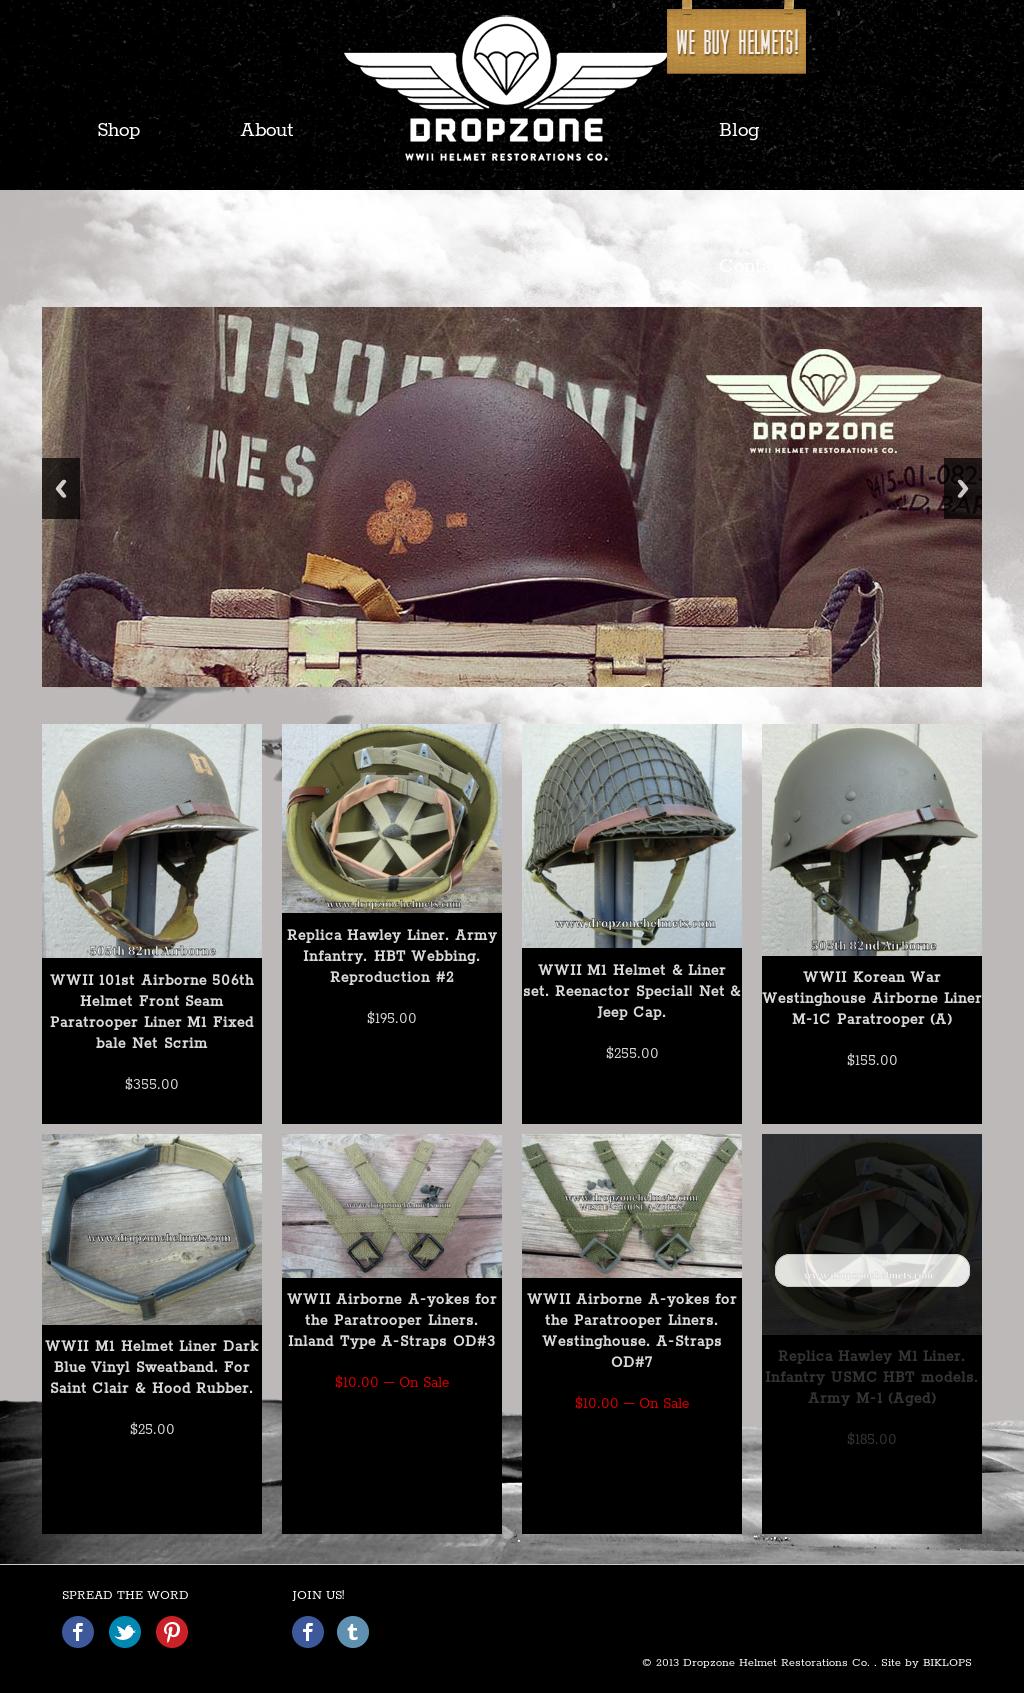 Dropzone Helmet Restorations Competitors, Revenue and